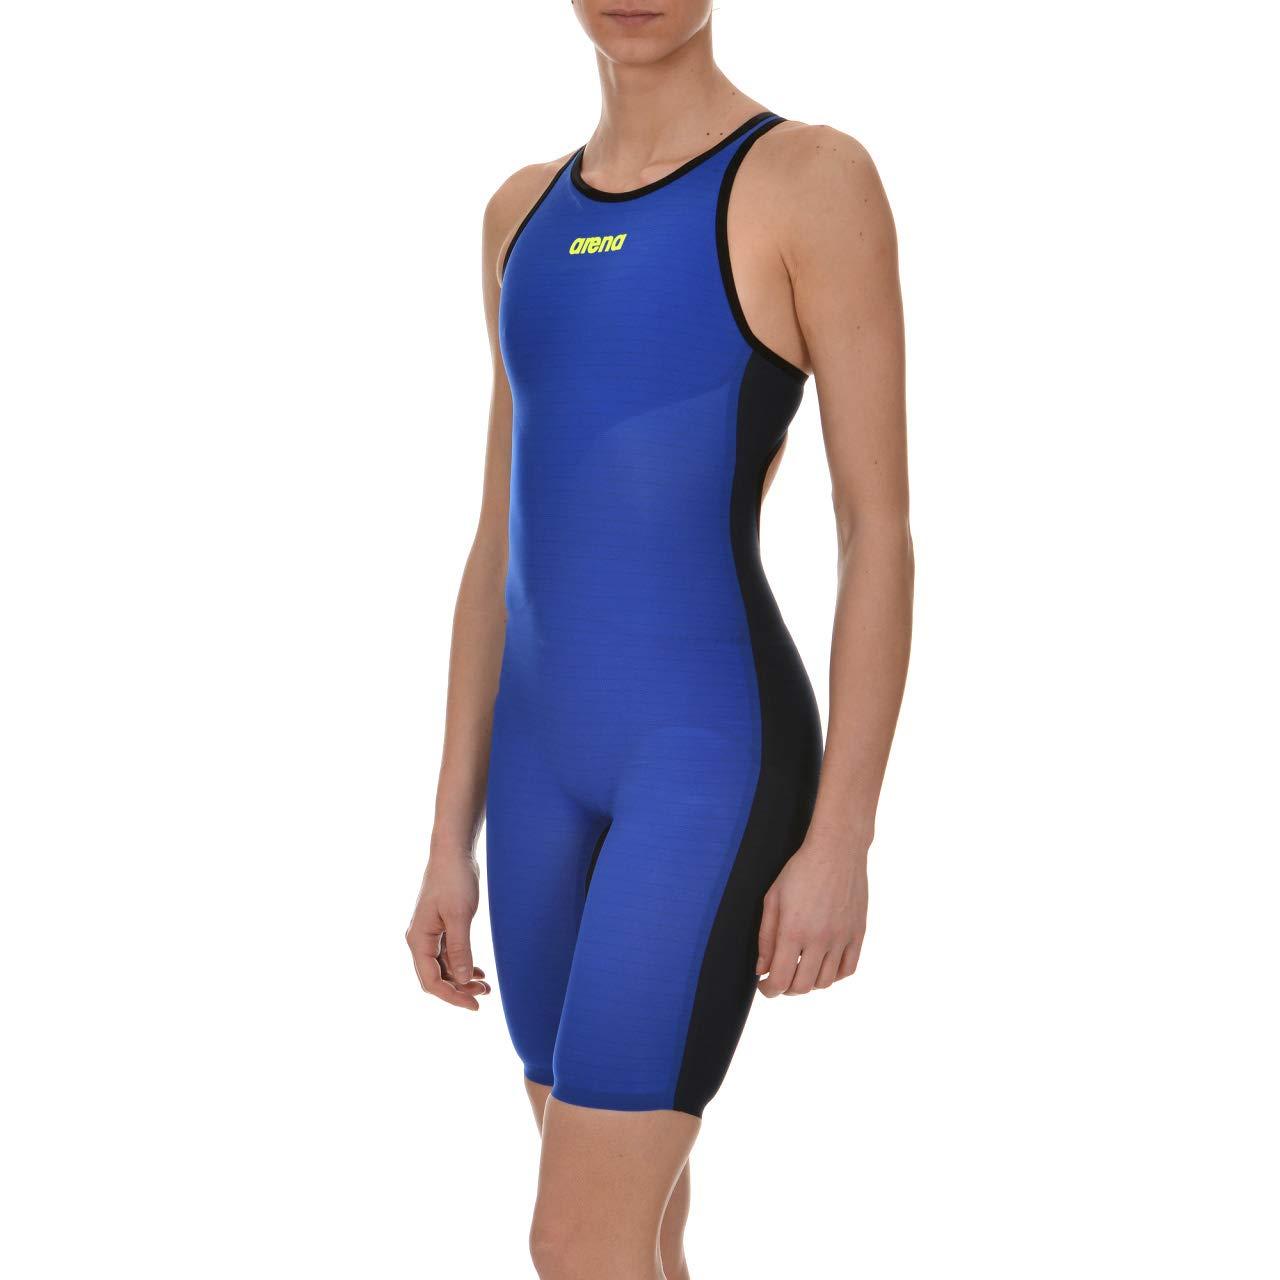 arena Powerskin Carbon Air FBSL Open Back Women's Racing Suit, Electric Blue / Titanium Blue, 22